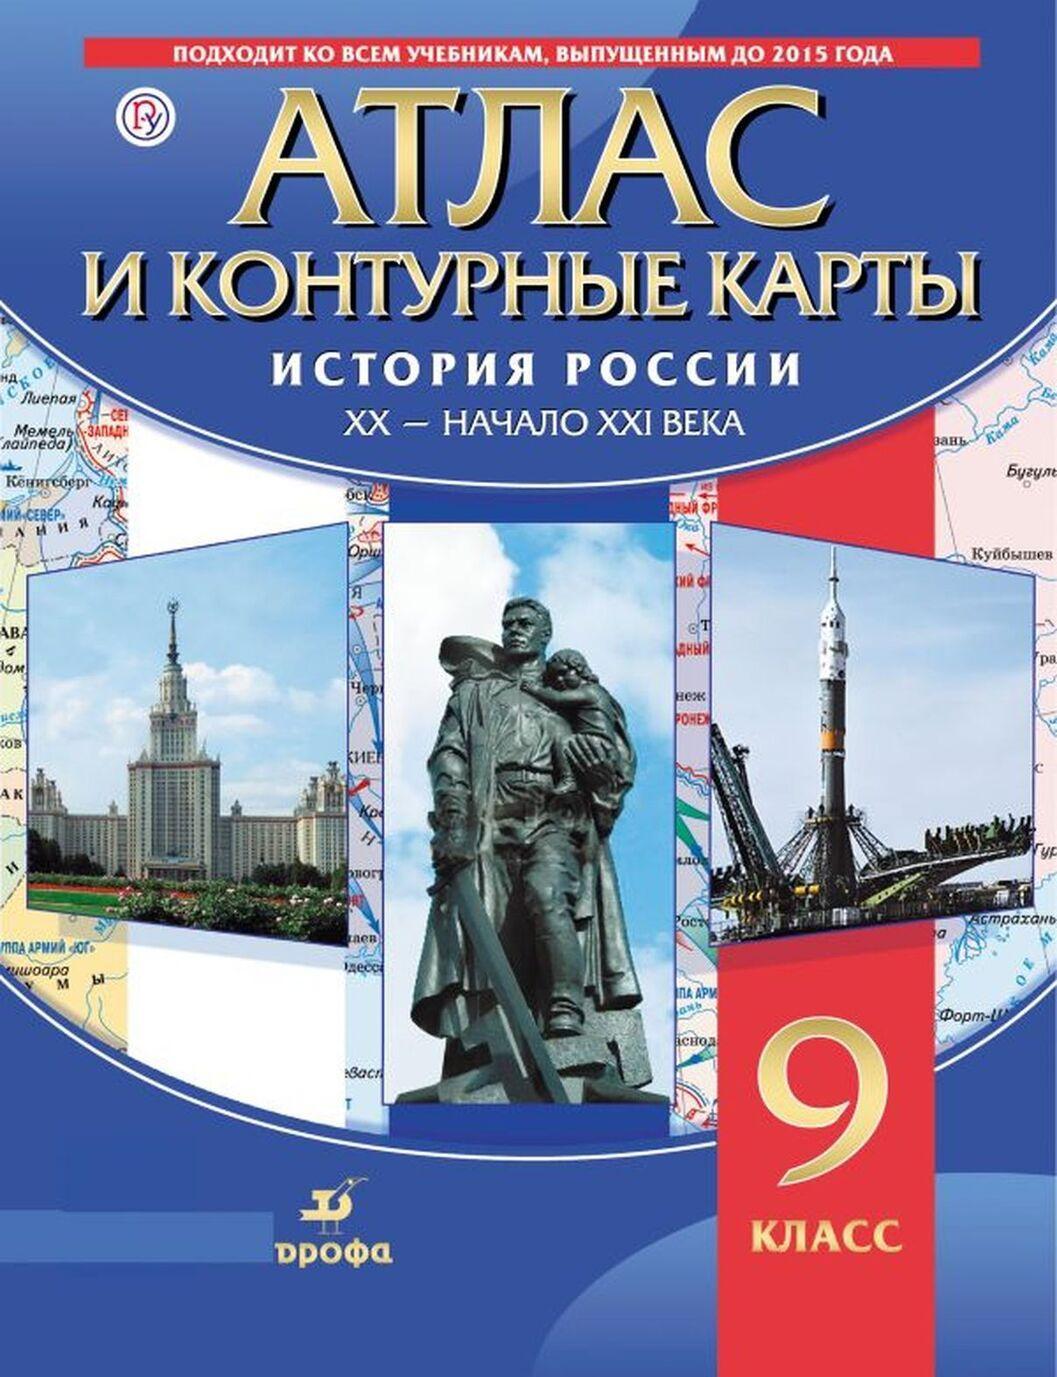 Istorija Rossii. XX-nachalo XXI v. Atlas i konturnye karty